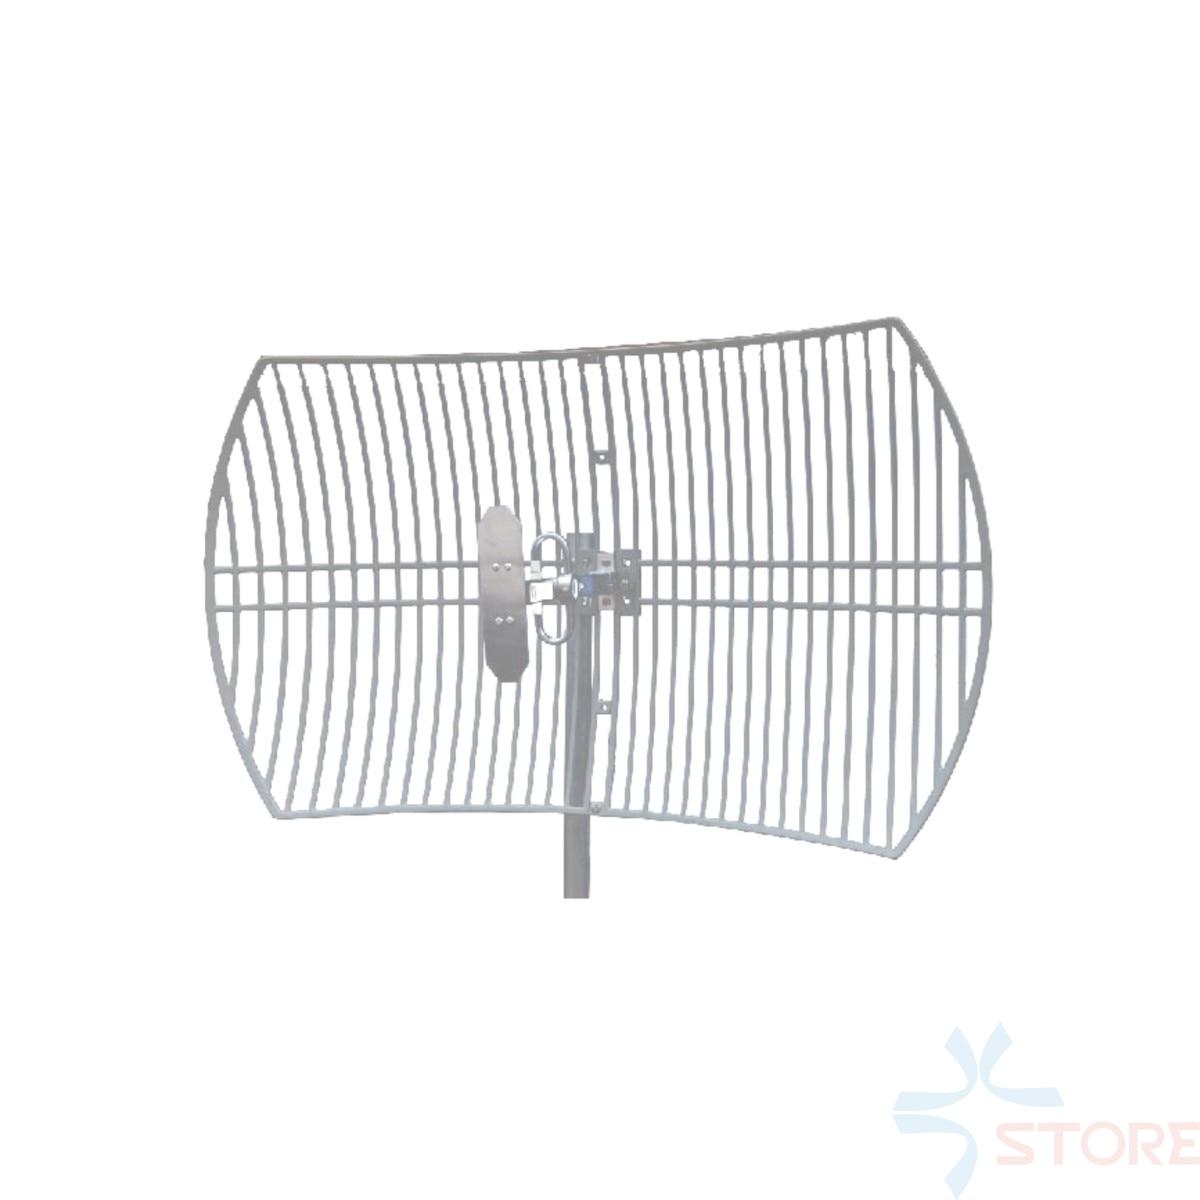 0.9Ghz 900MHz 15dBi High Gain GSM Directional Parabolic Grid Antenna For UHF CUAV Data Transmission Radio Data Modem